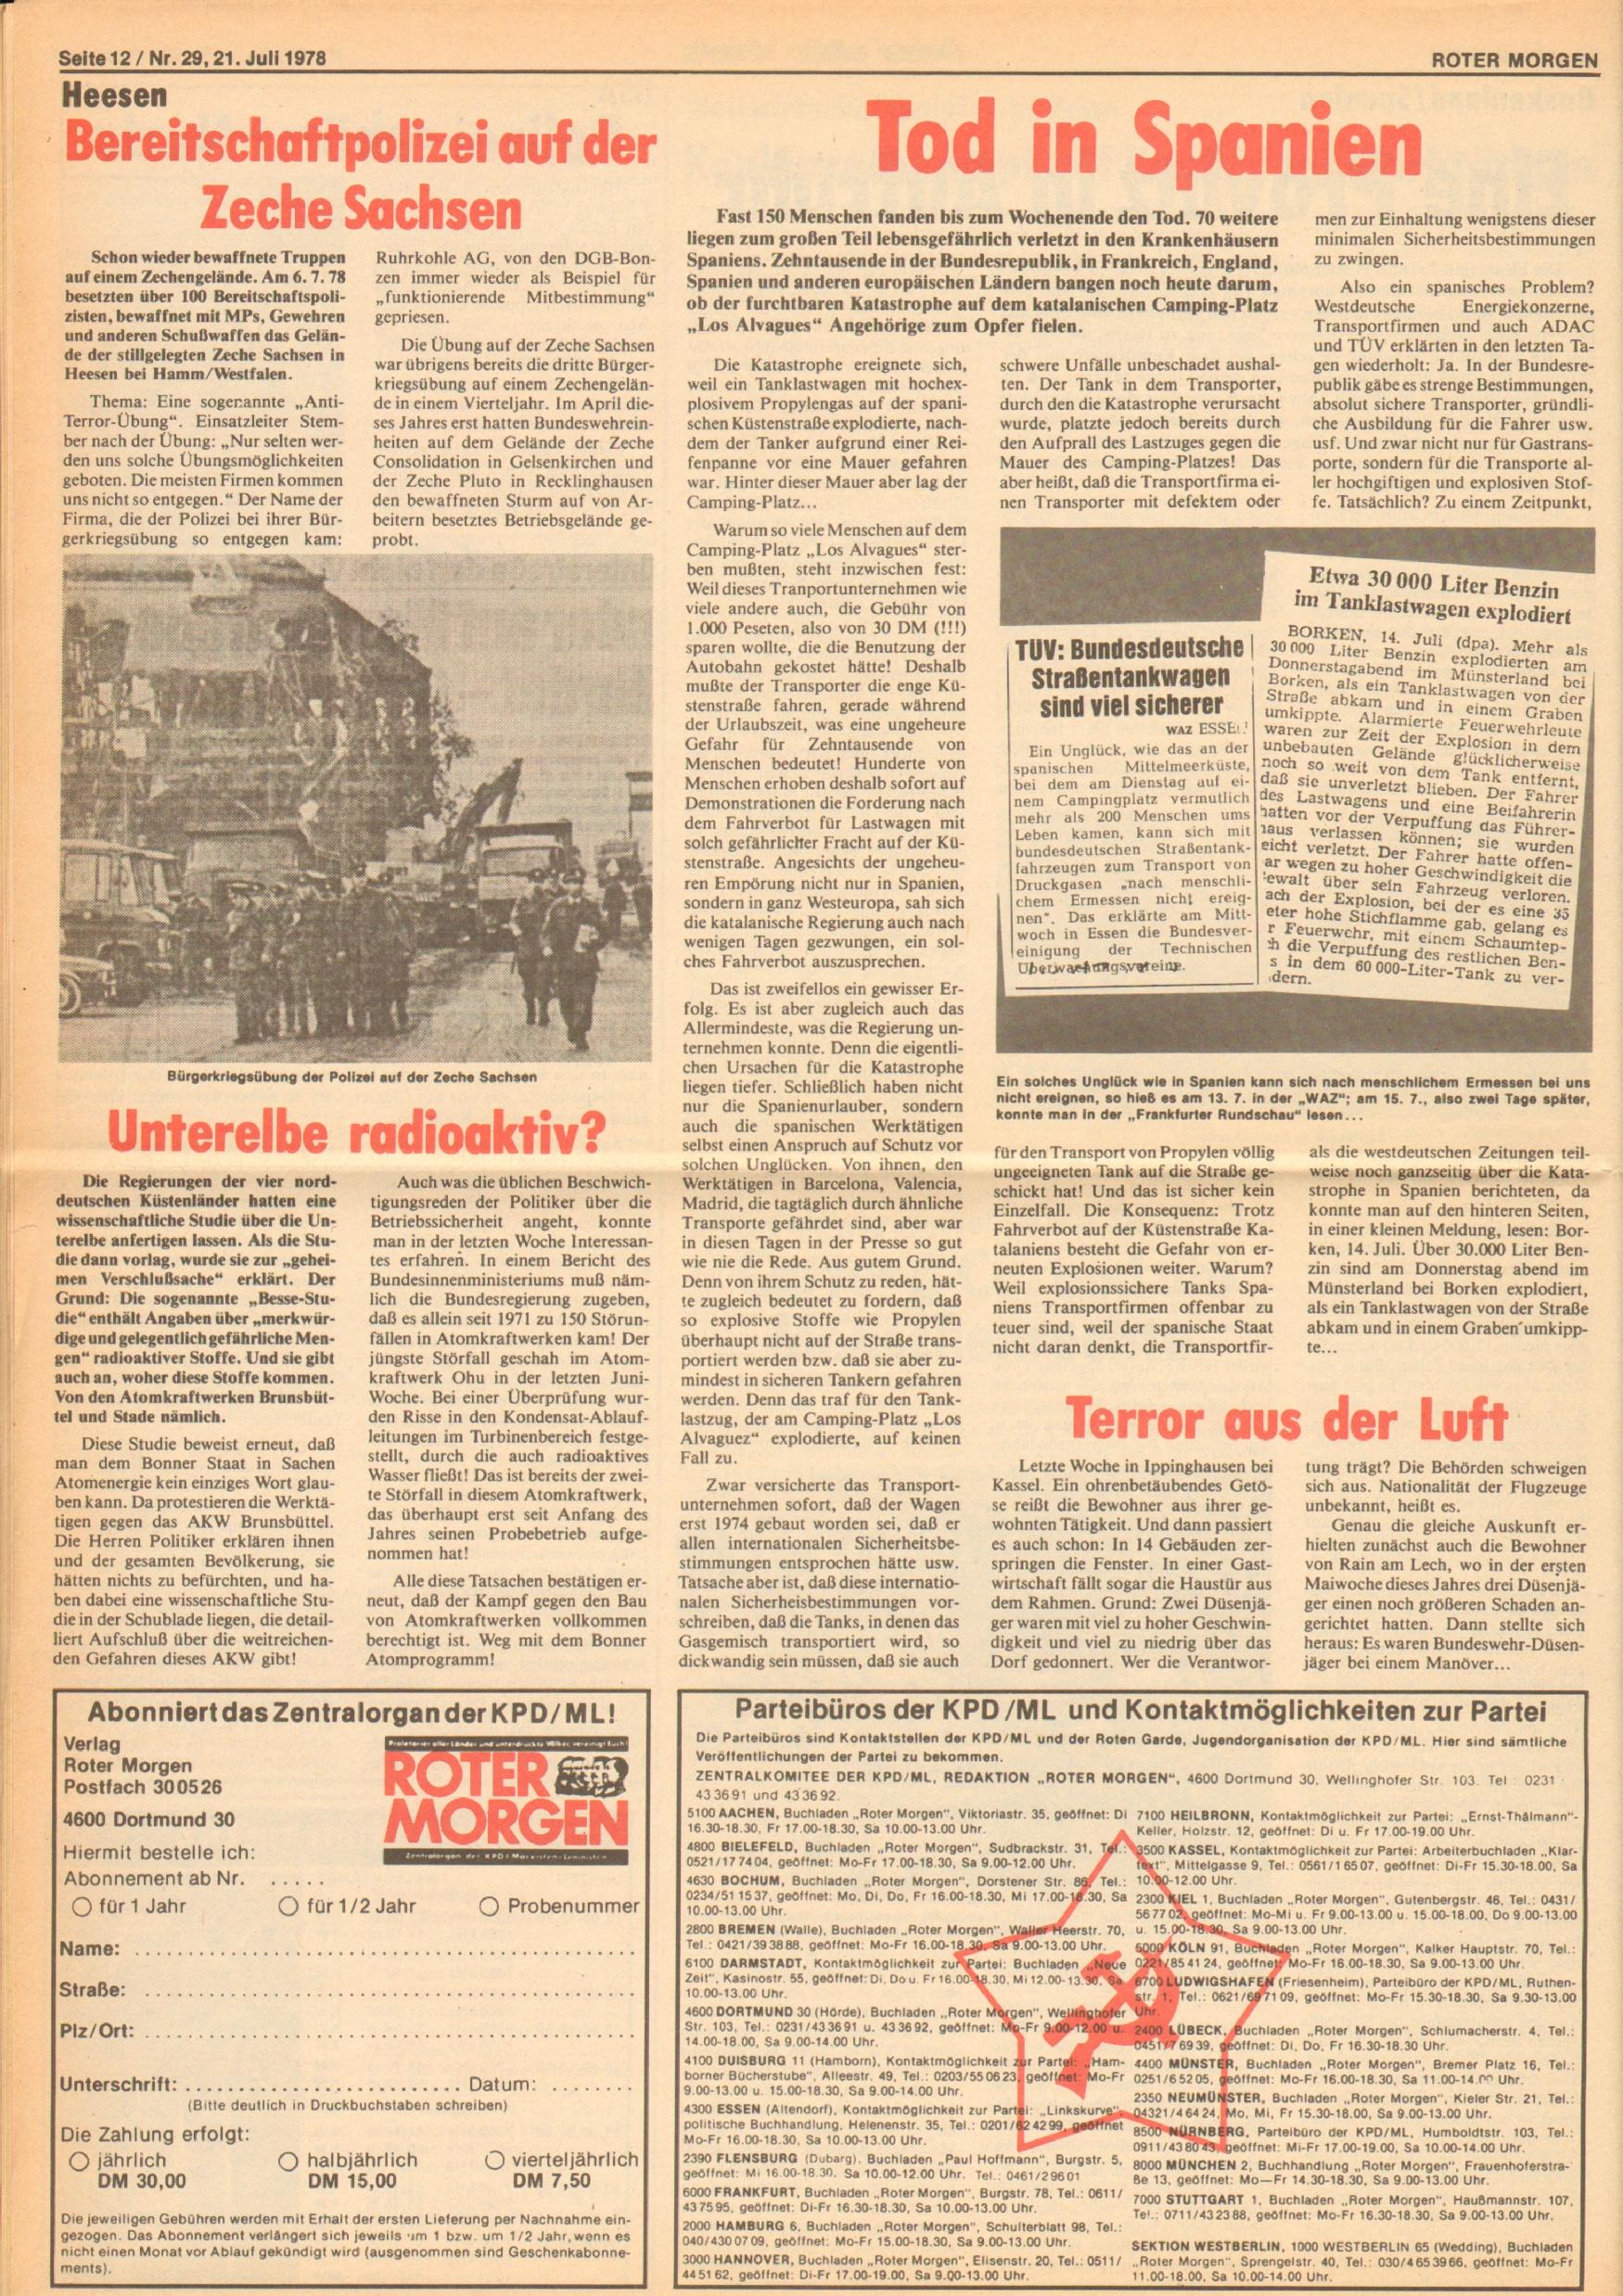 Roter Morgen, 12. Jg., 21. Juli 1978, Nr. 29, Seite 12